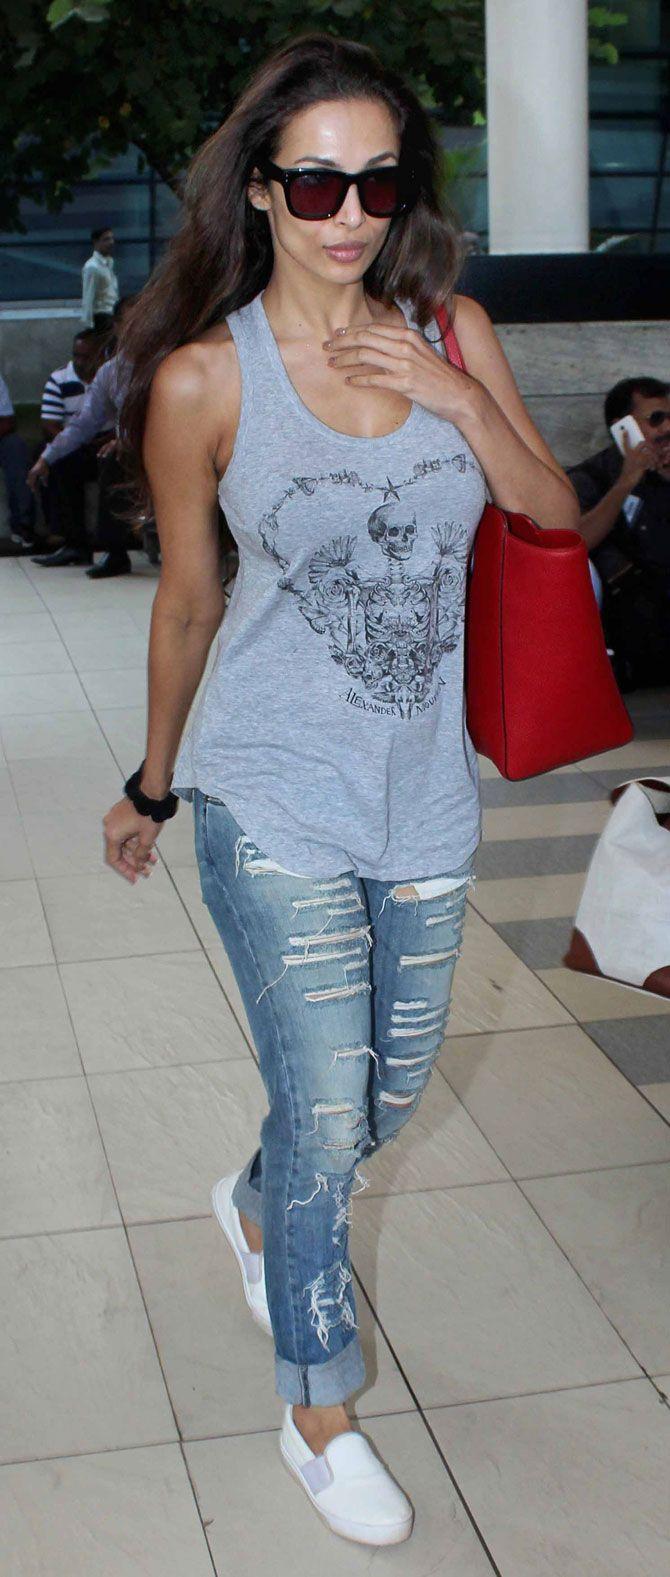 Malaika Arora Khan at Mumbai airport. #Bollywood #Fashion #Style #Beauty #Hot #Sexy #WAGS